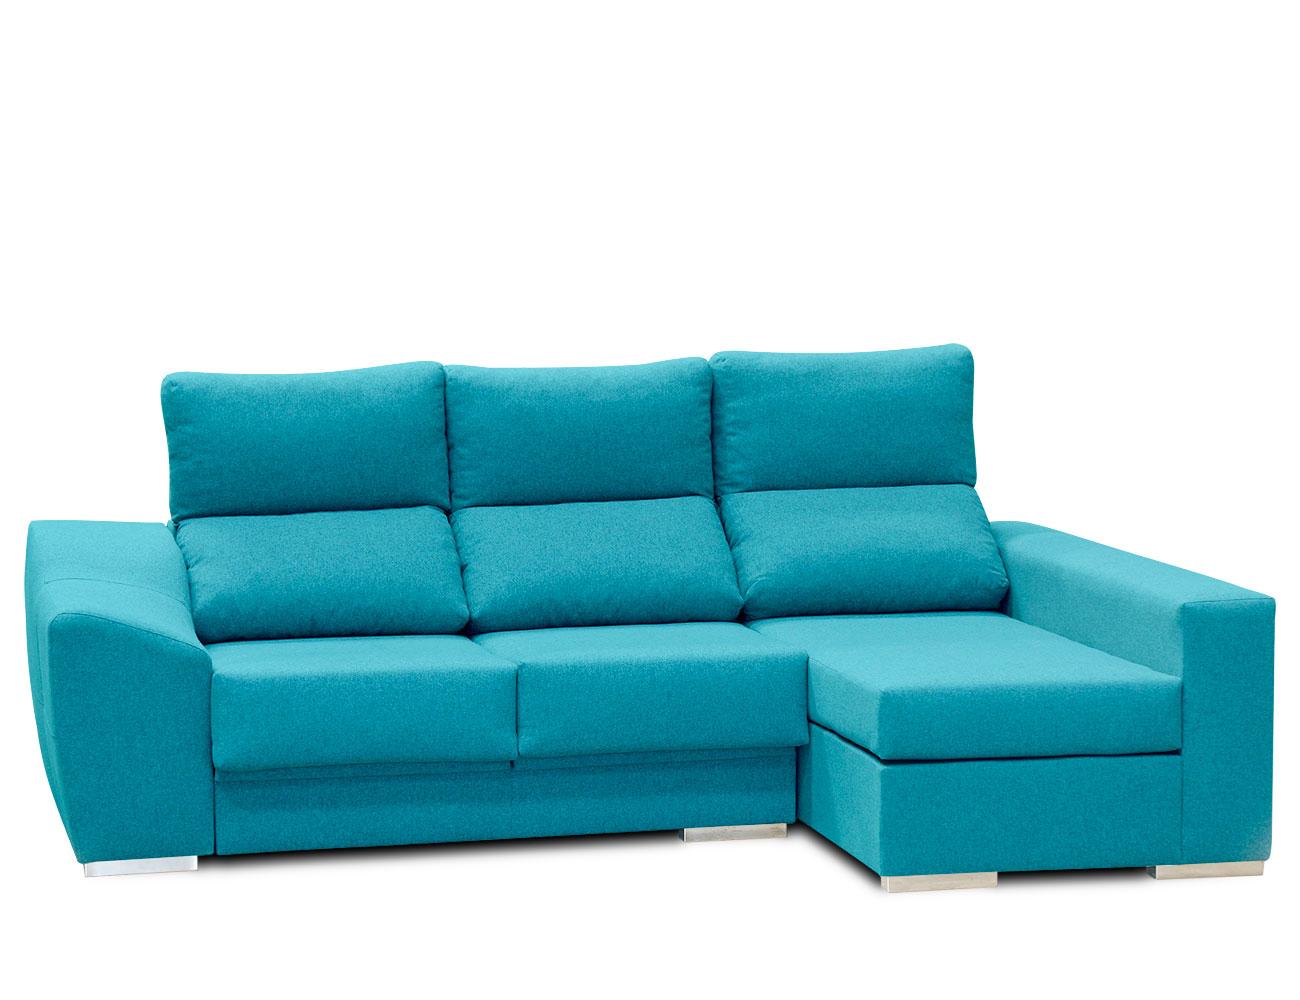 Sofa chaiselongue moderno turquesa 5